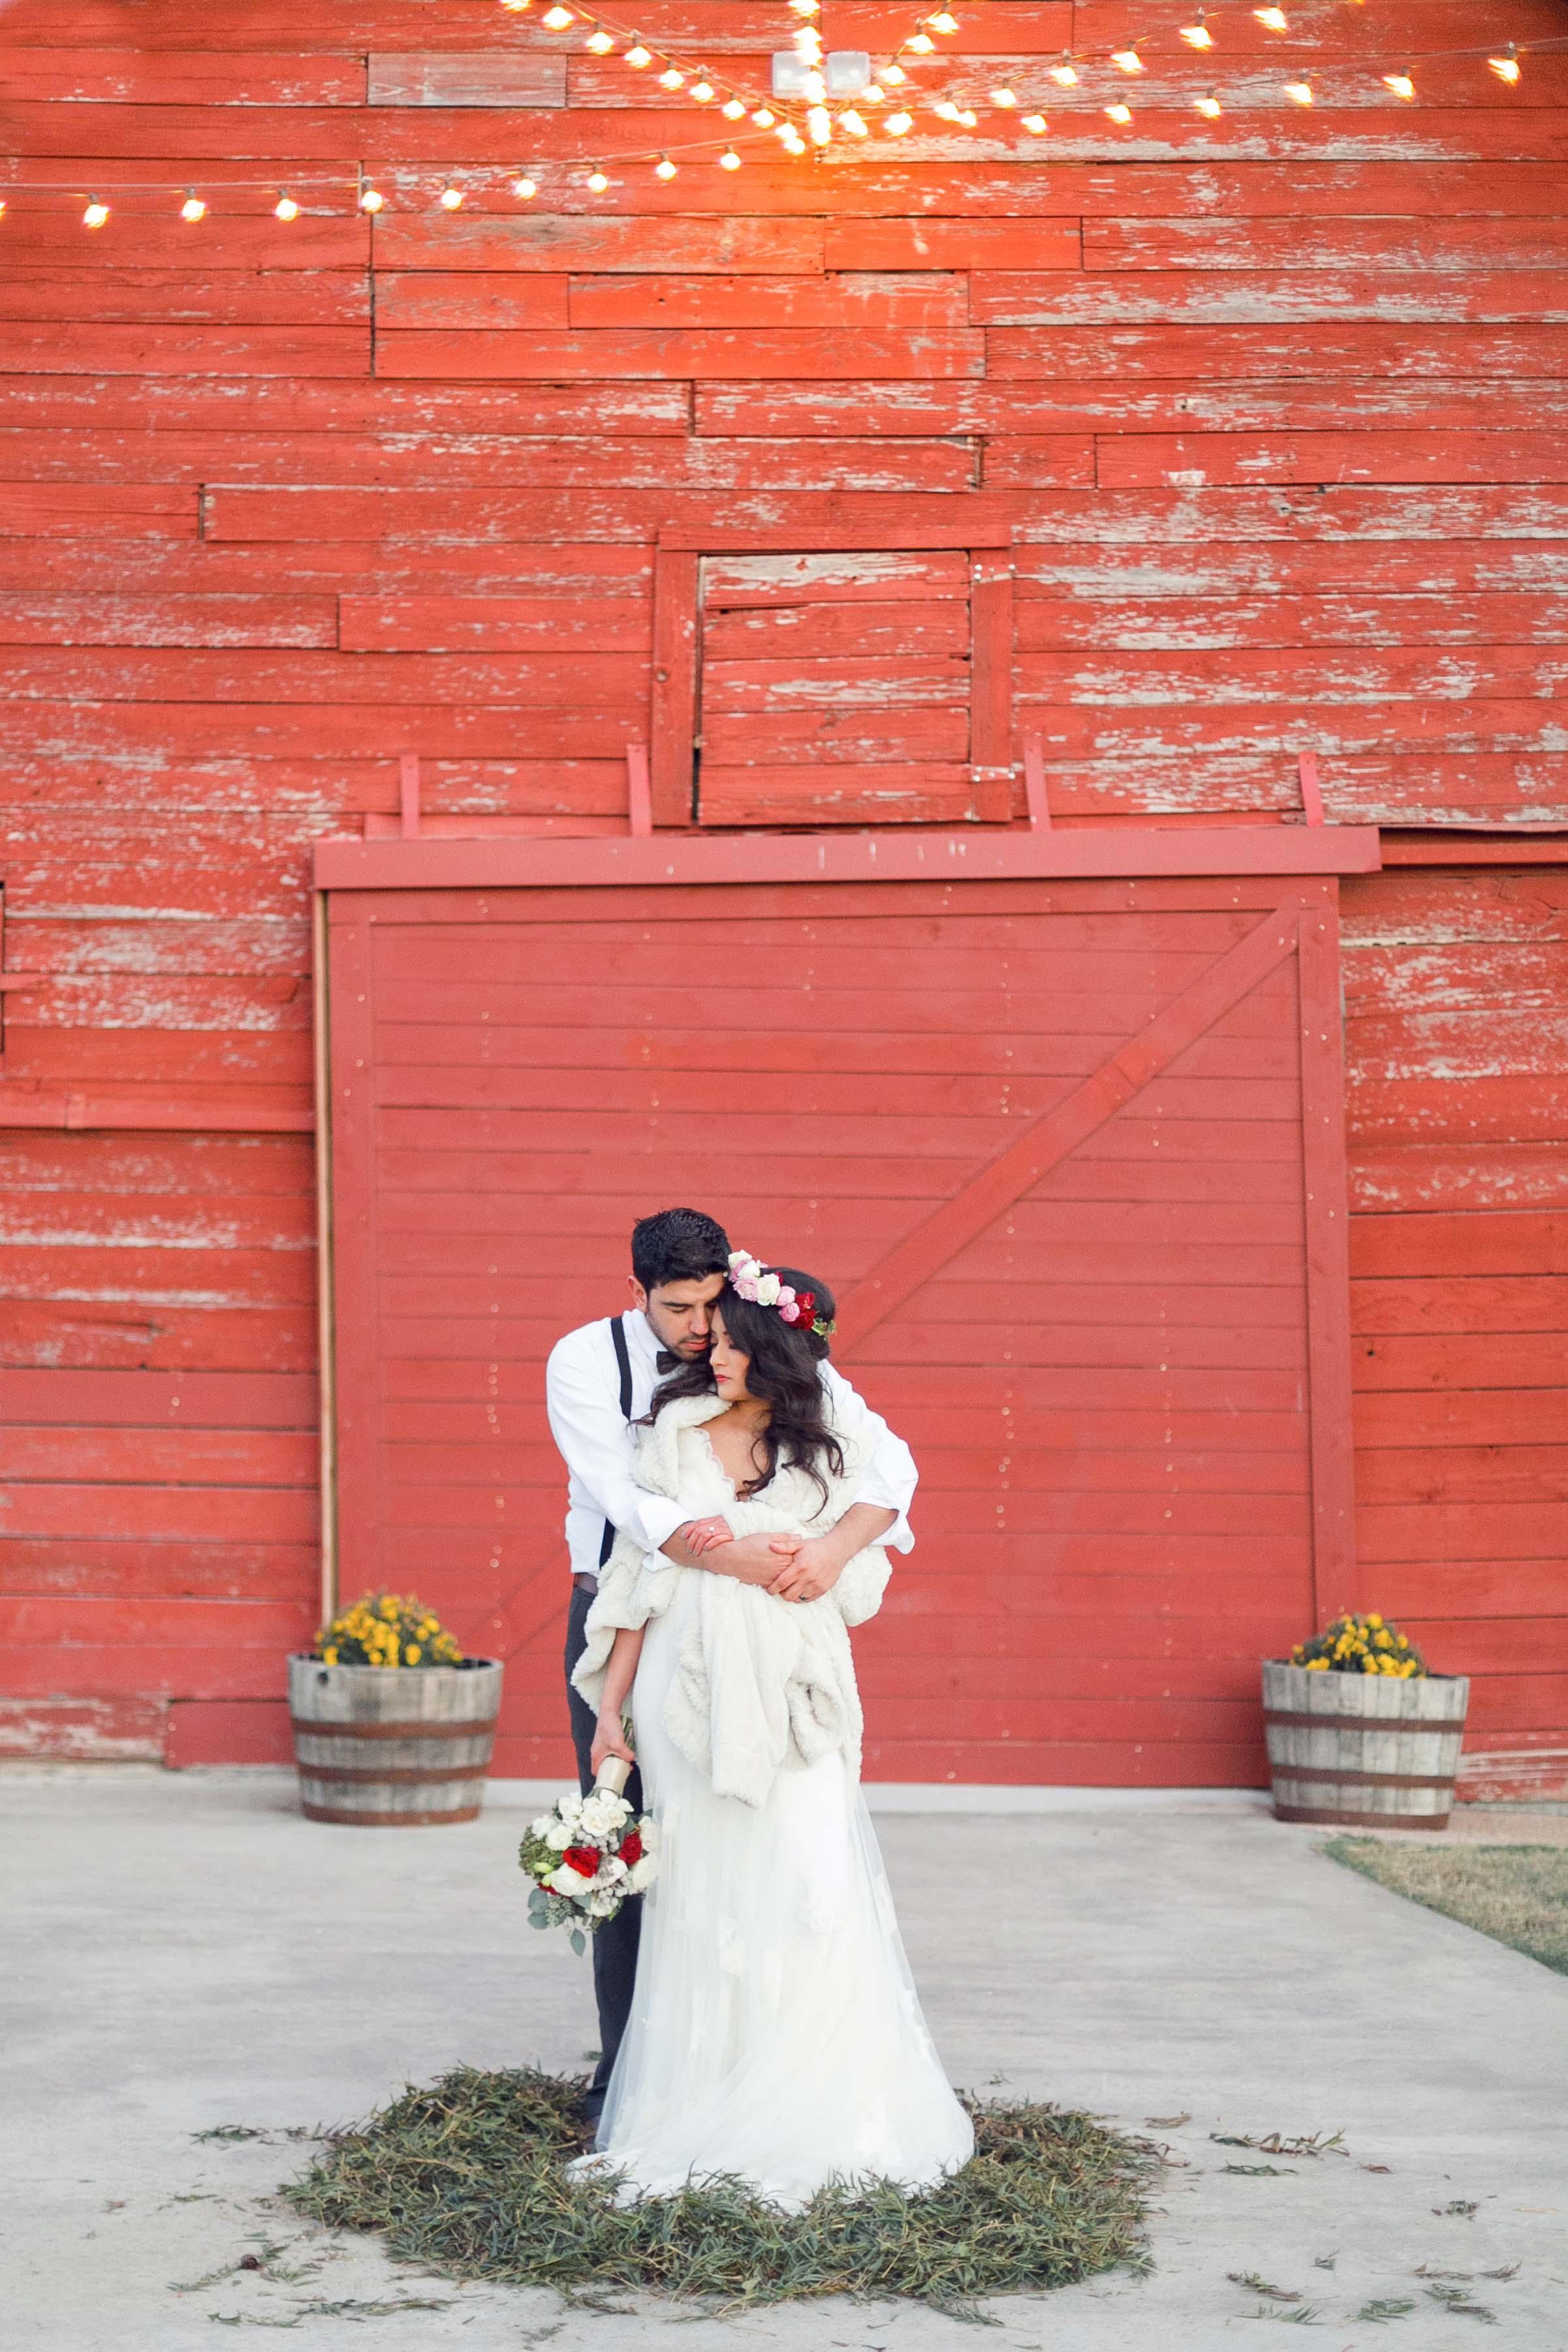 rustic-wedding-venues-across-the-us-rustic-grace-estate-jillian-hogan-photography